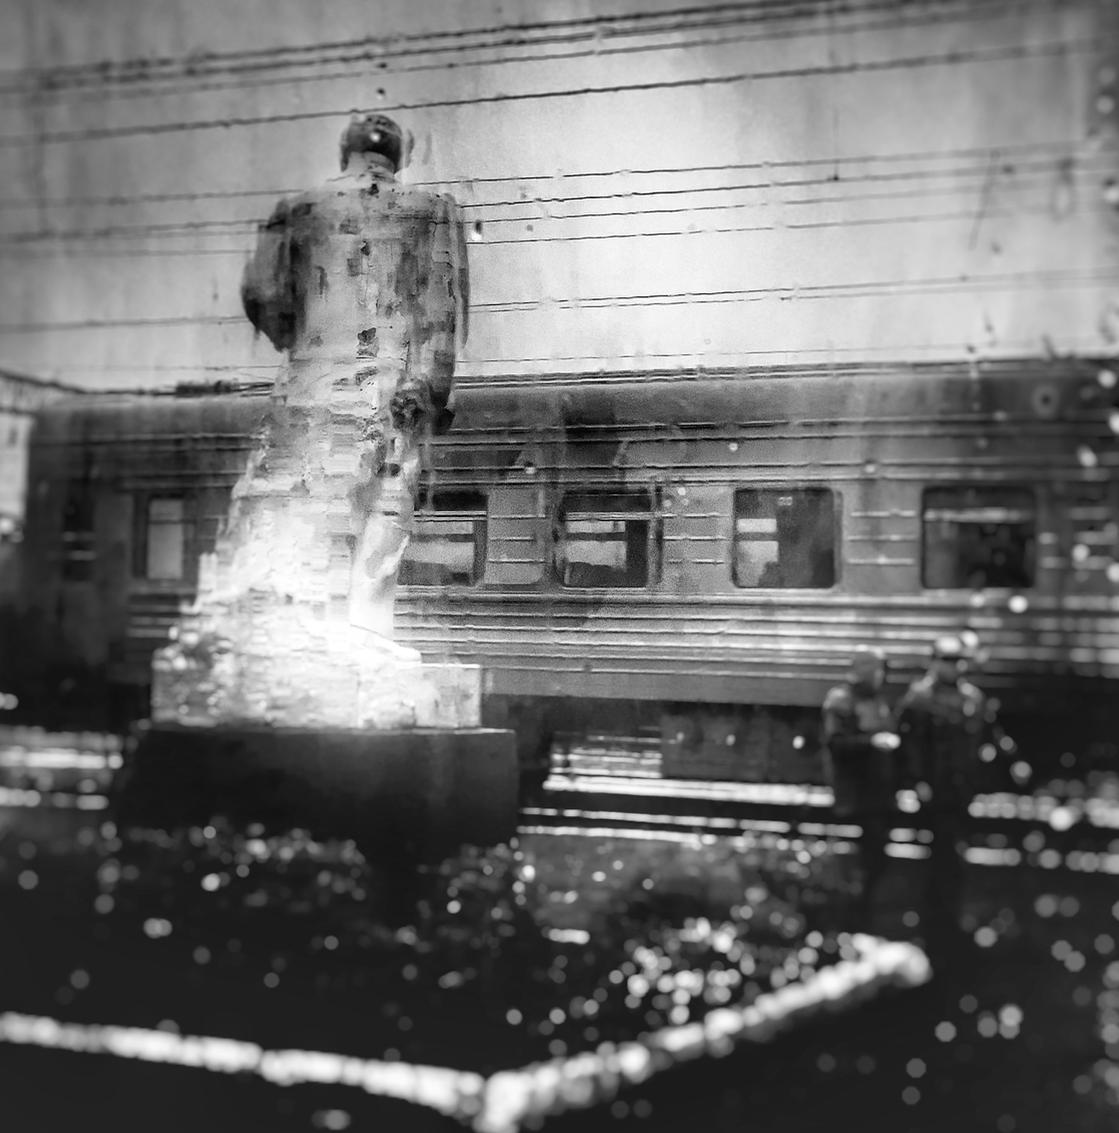 Le spectre de Lénine. Nikolo-Poloma, 10.8.2019